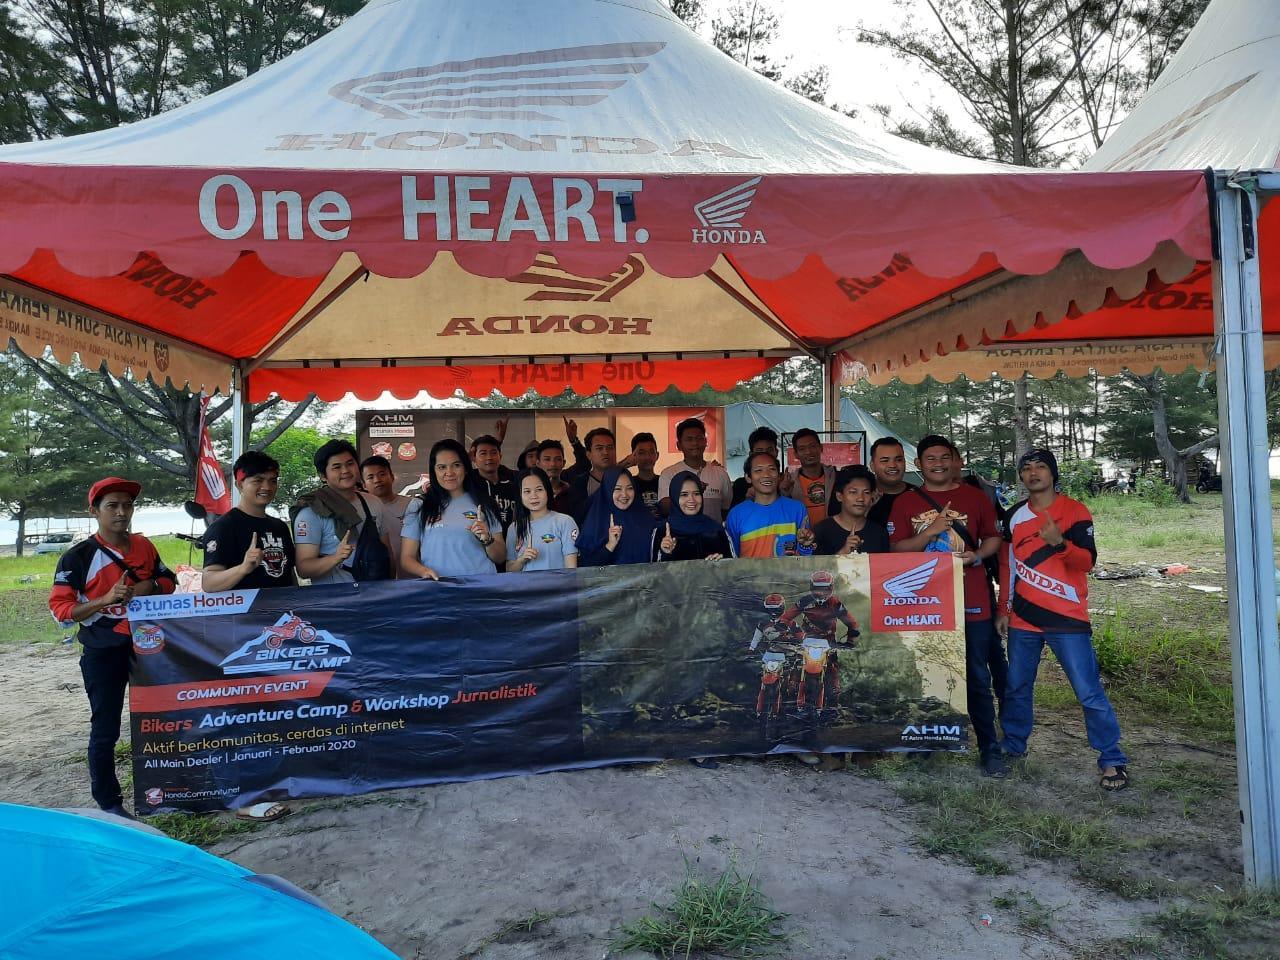 Gelar Bikers Camp dan Workshop Jurnalistik, PT Asia Surya Perkasa Rangkul Komunitas Motor Honda